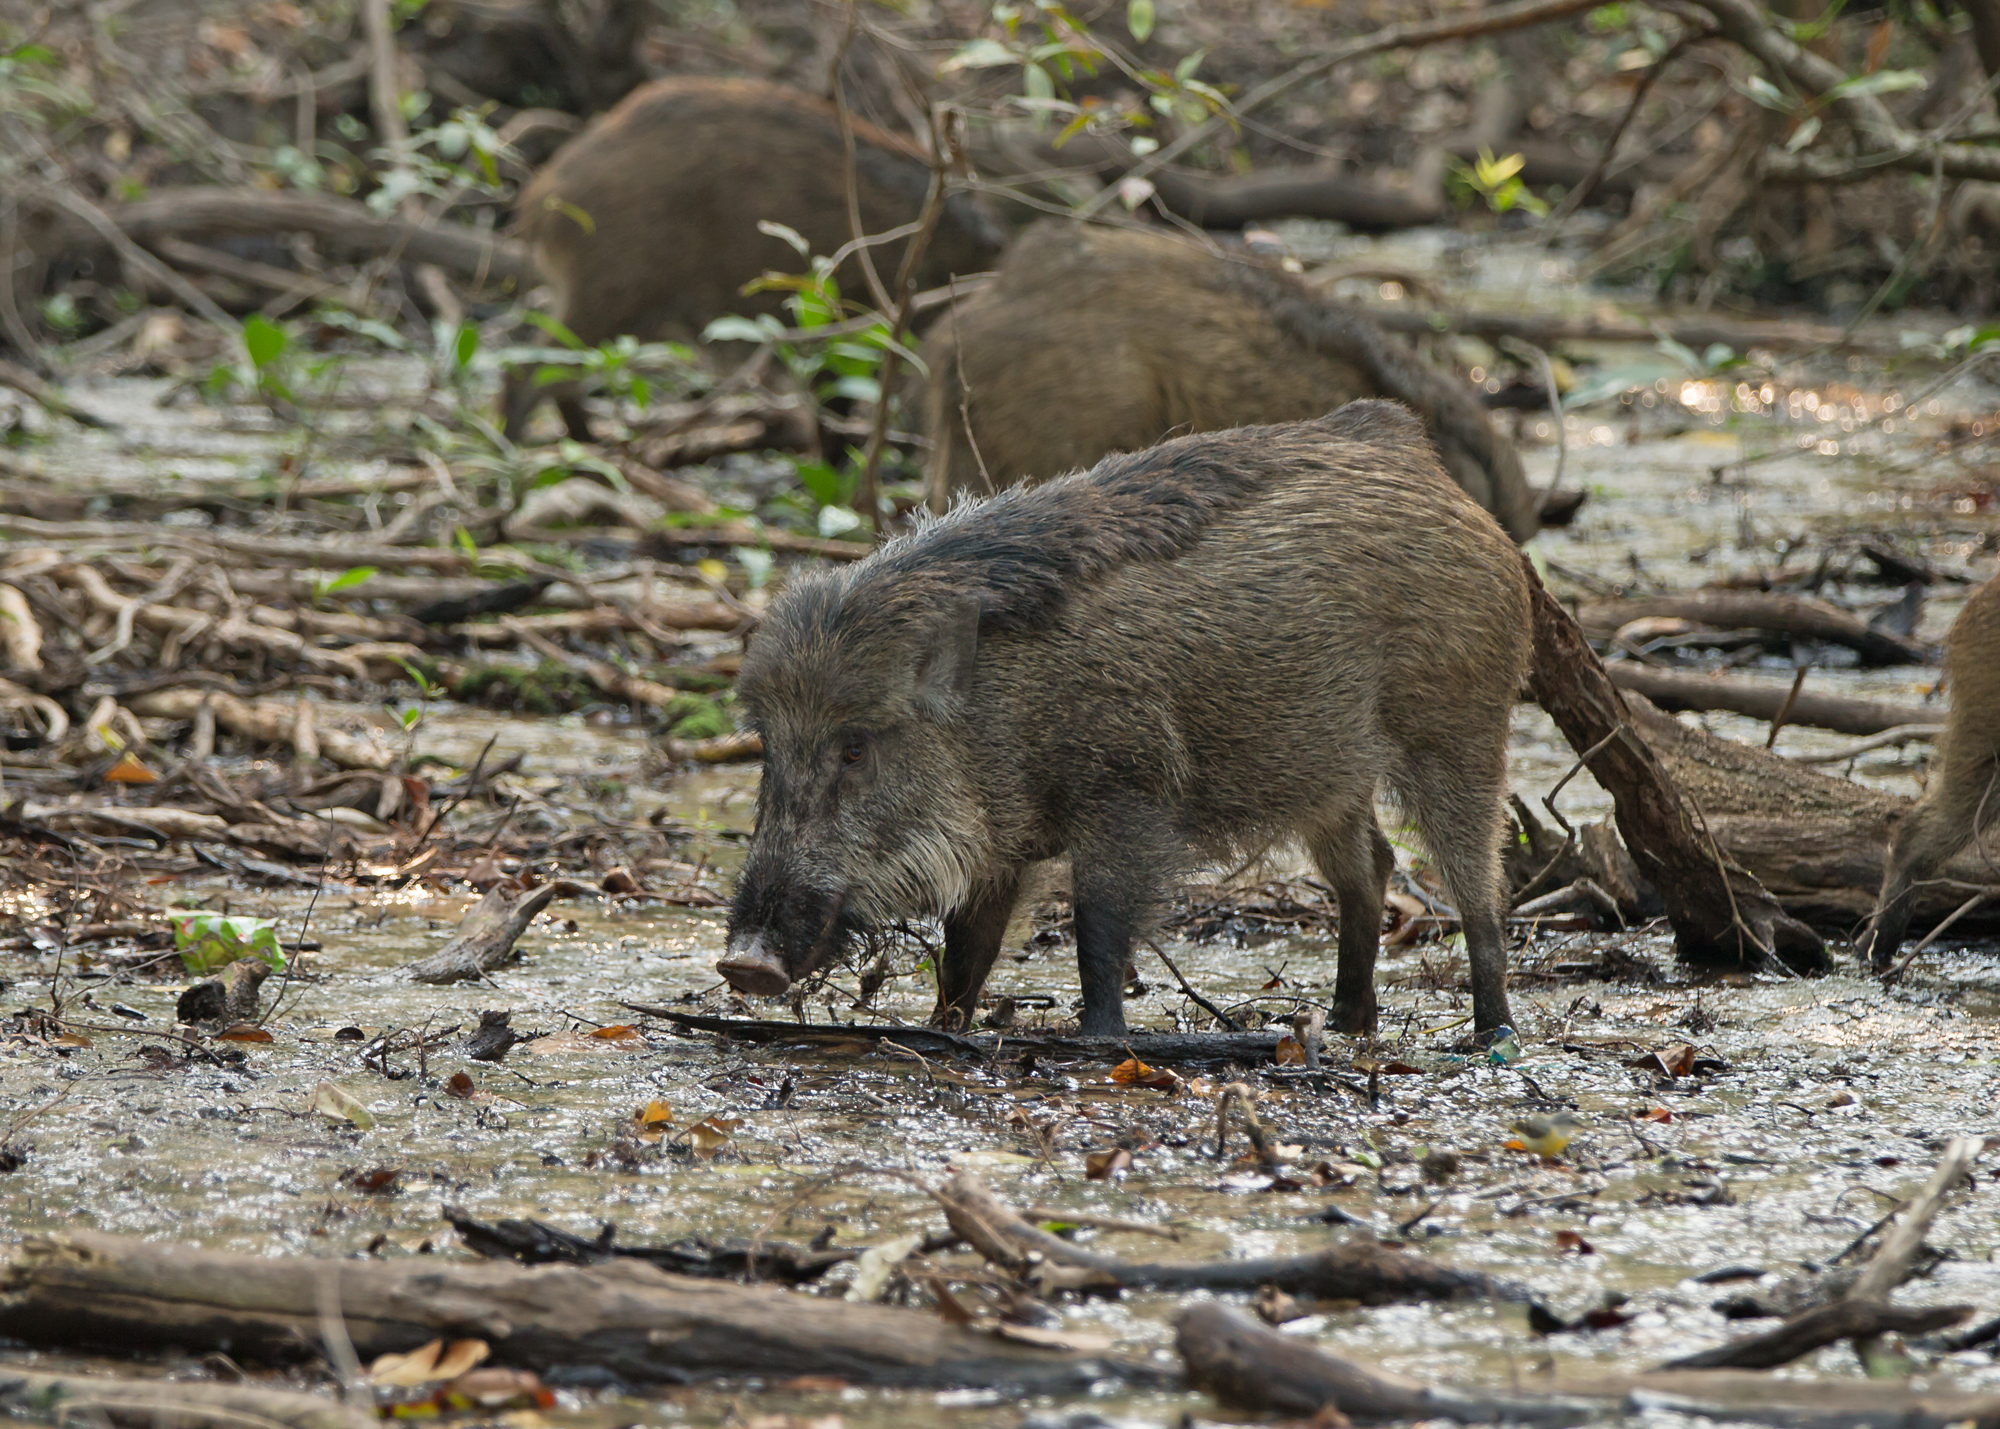 Wild Boar foraging in a forest stream at Bandhavgarh.